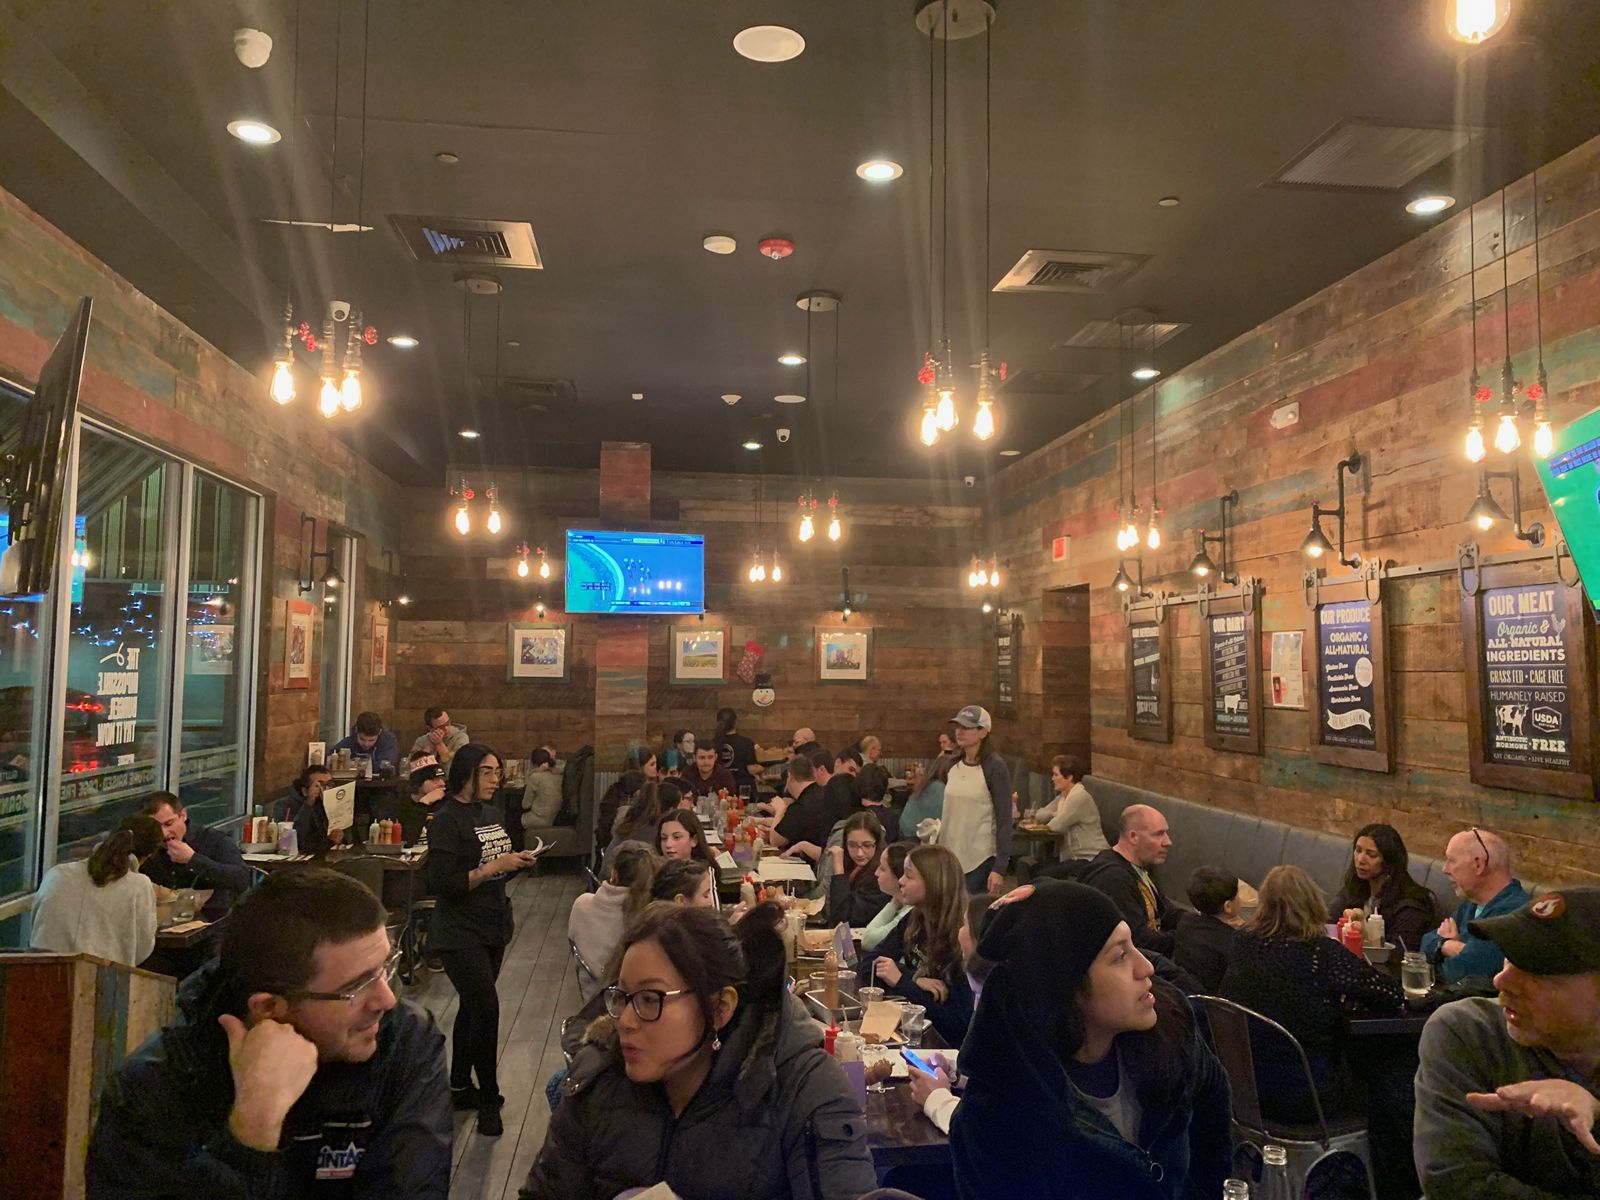 Burger Village Franchise Goes International with Canadian Expansion